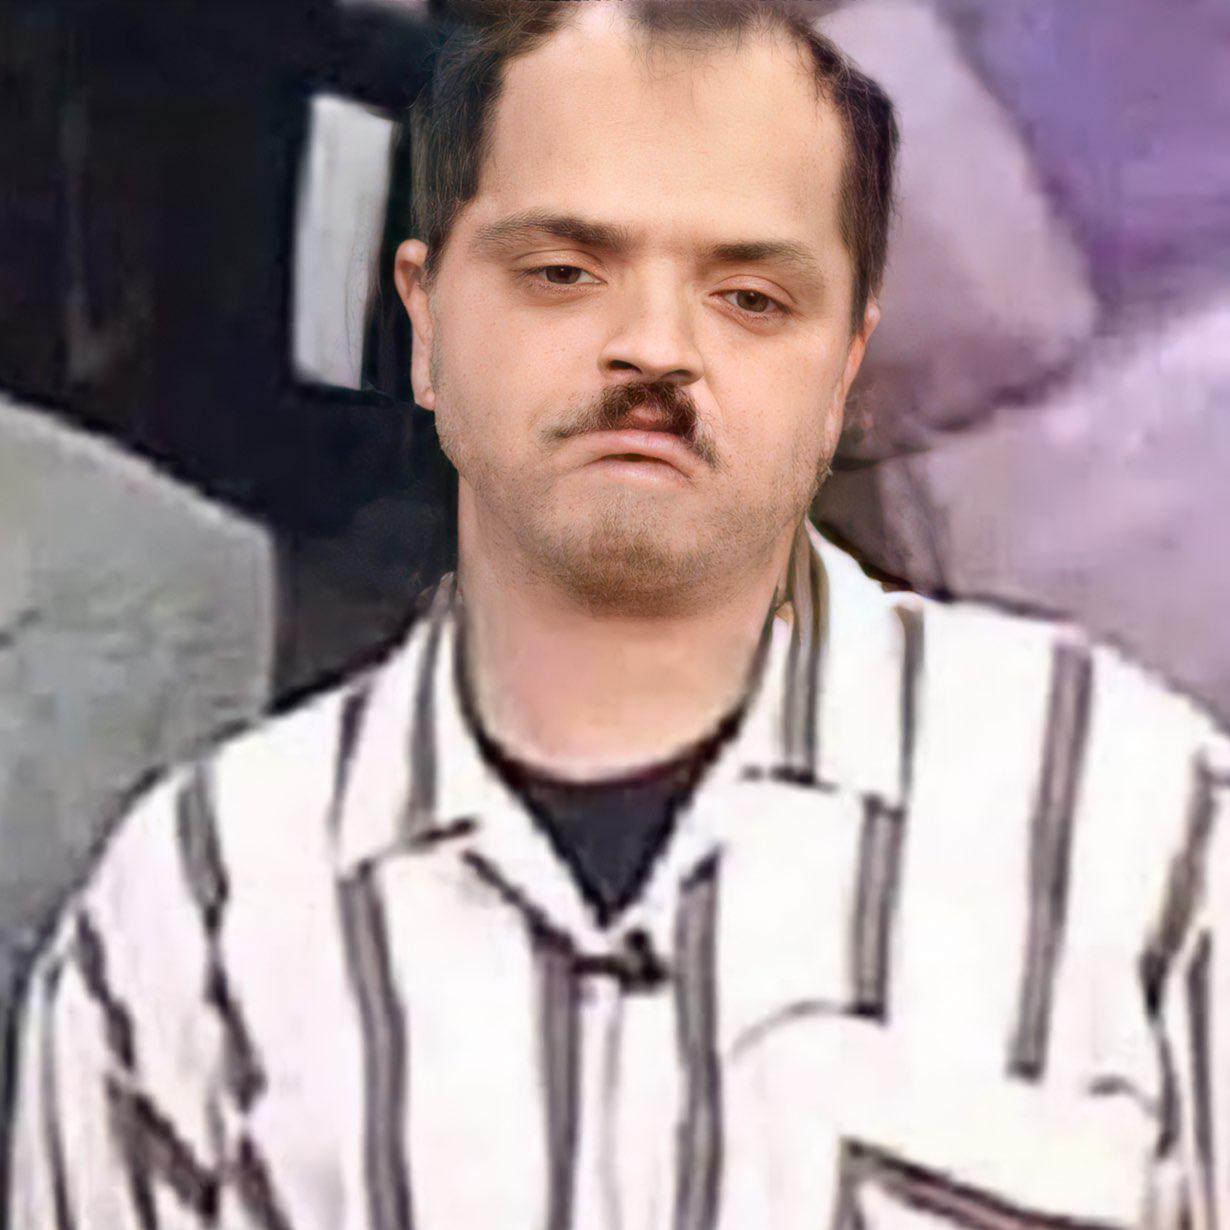 محمد الشرنوبي Clubhouse